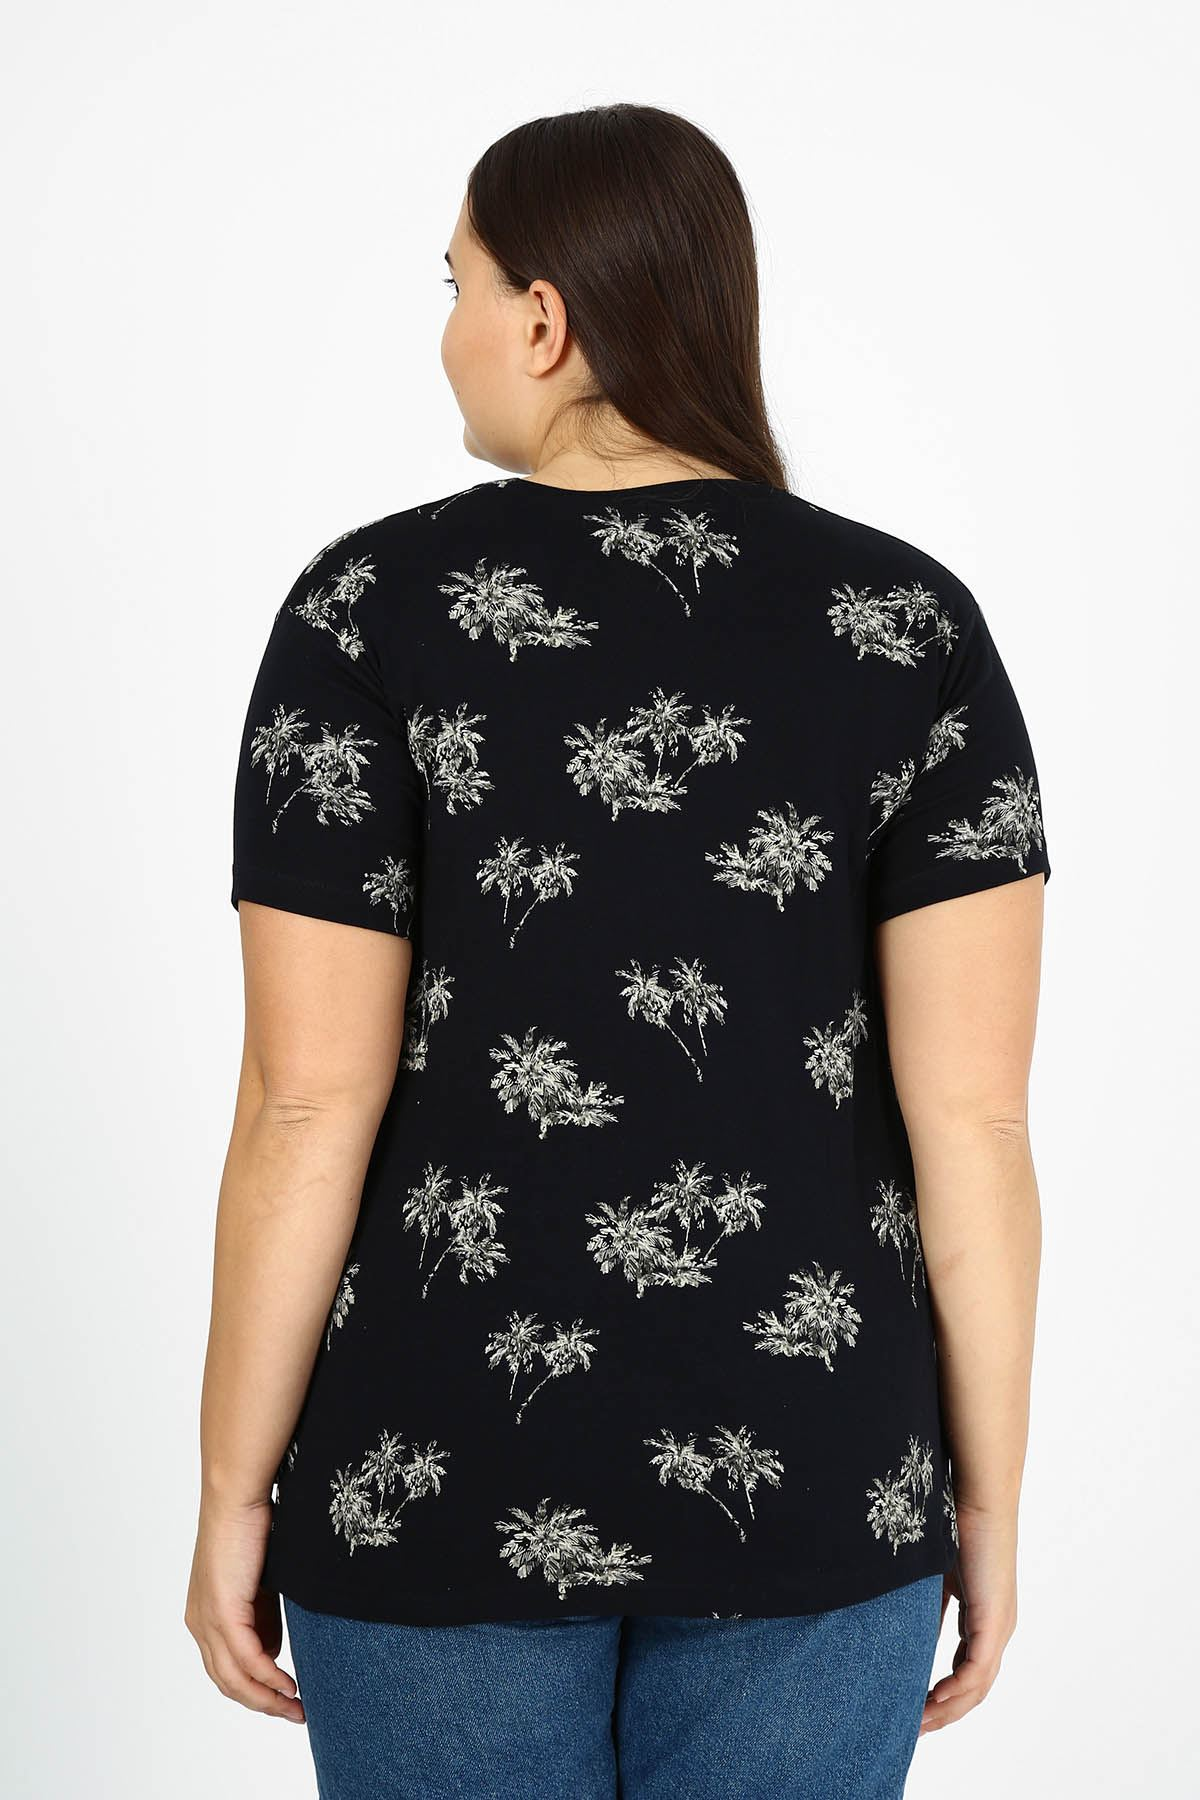 Siyah Desenli T-shirt 21B-1778